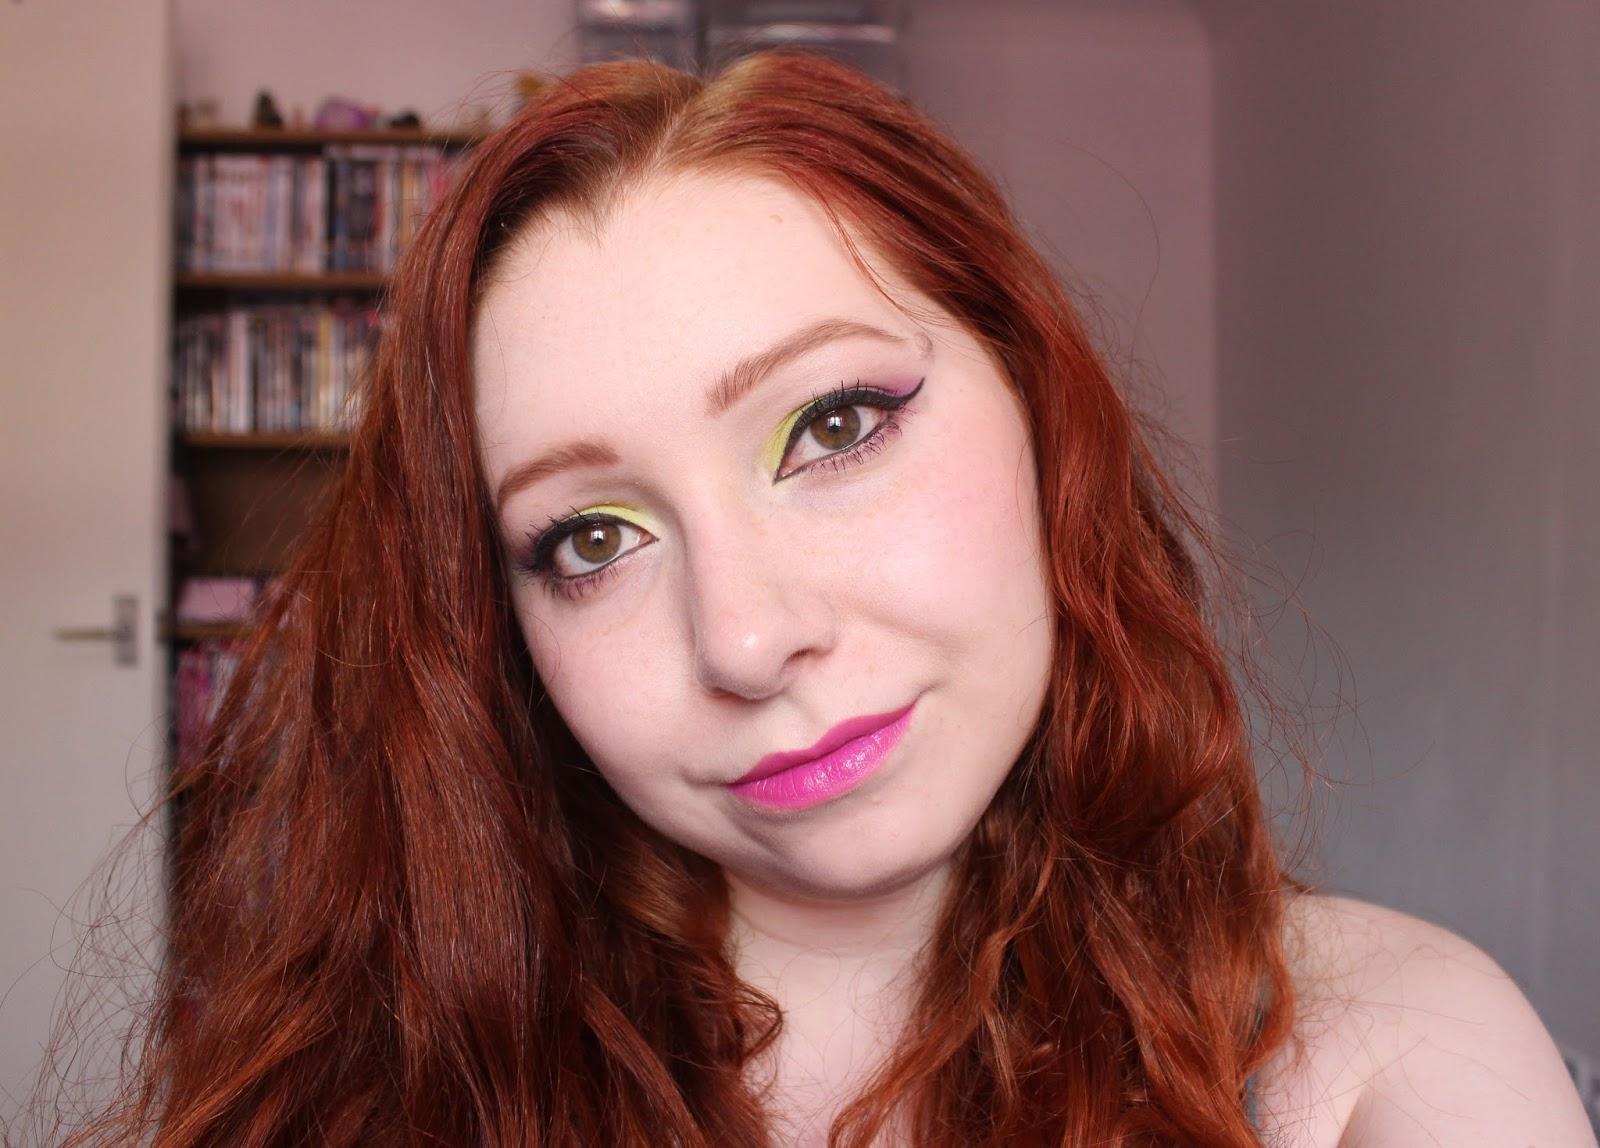 Makeup: Brights